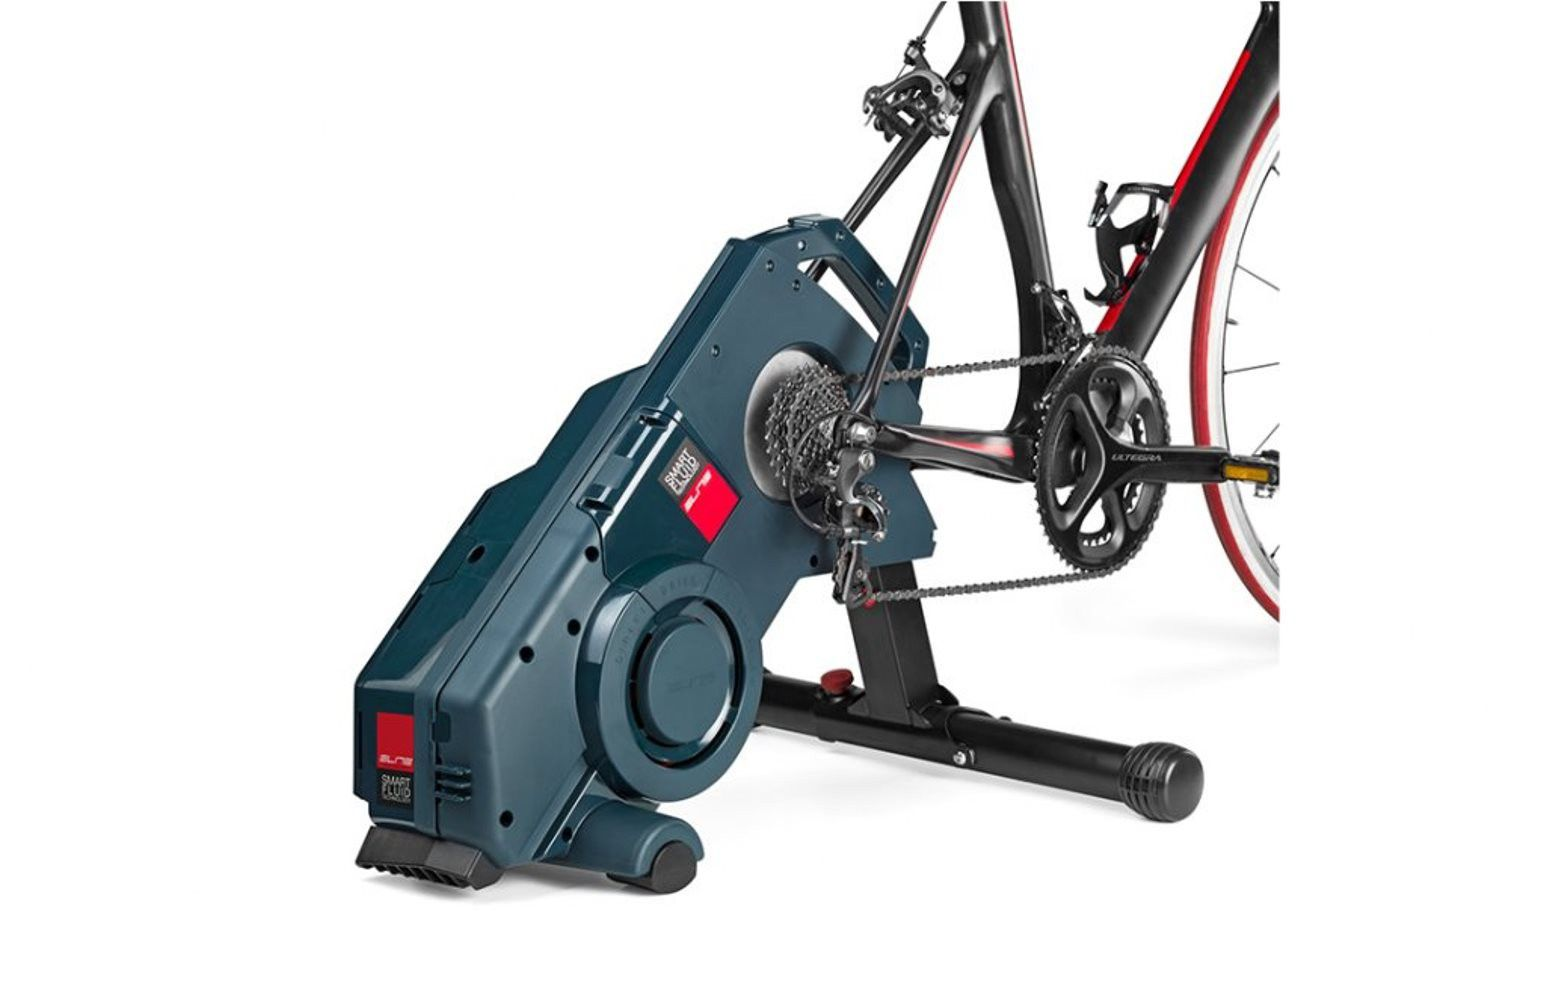 Rolo de Treino para Bicicleta Elite Turno Smart Fluid